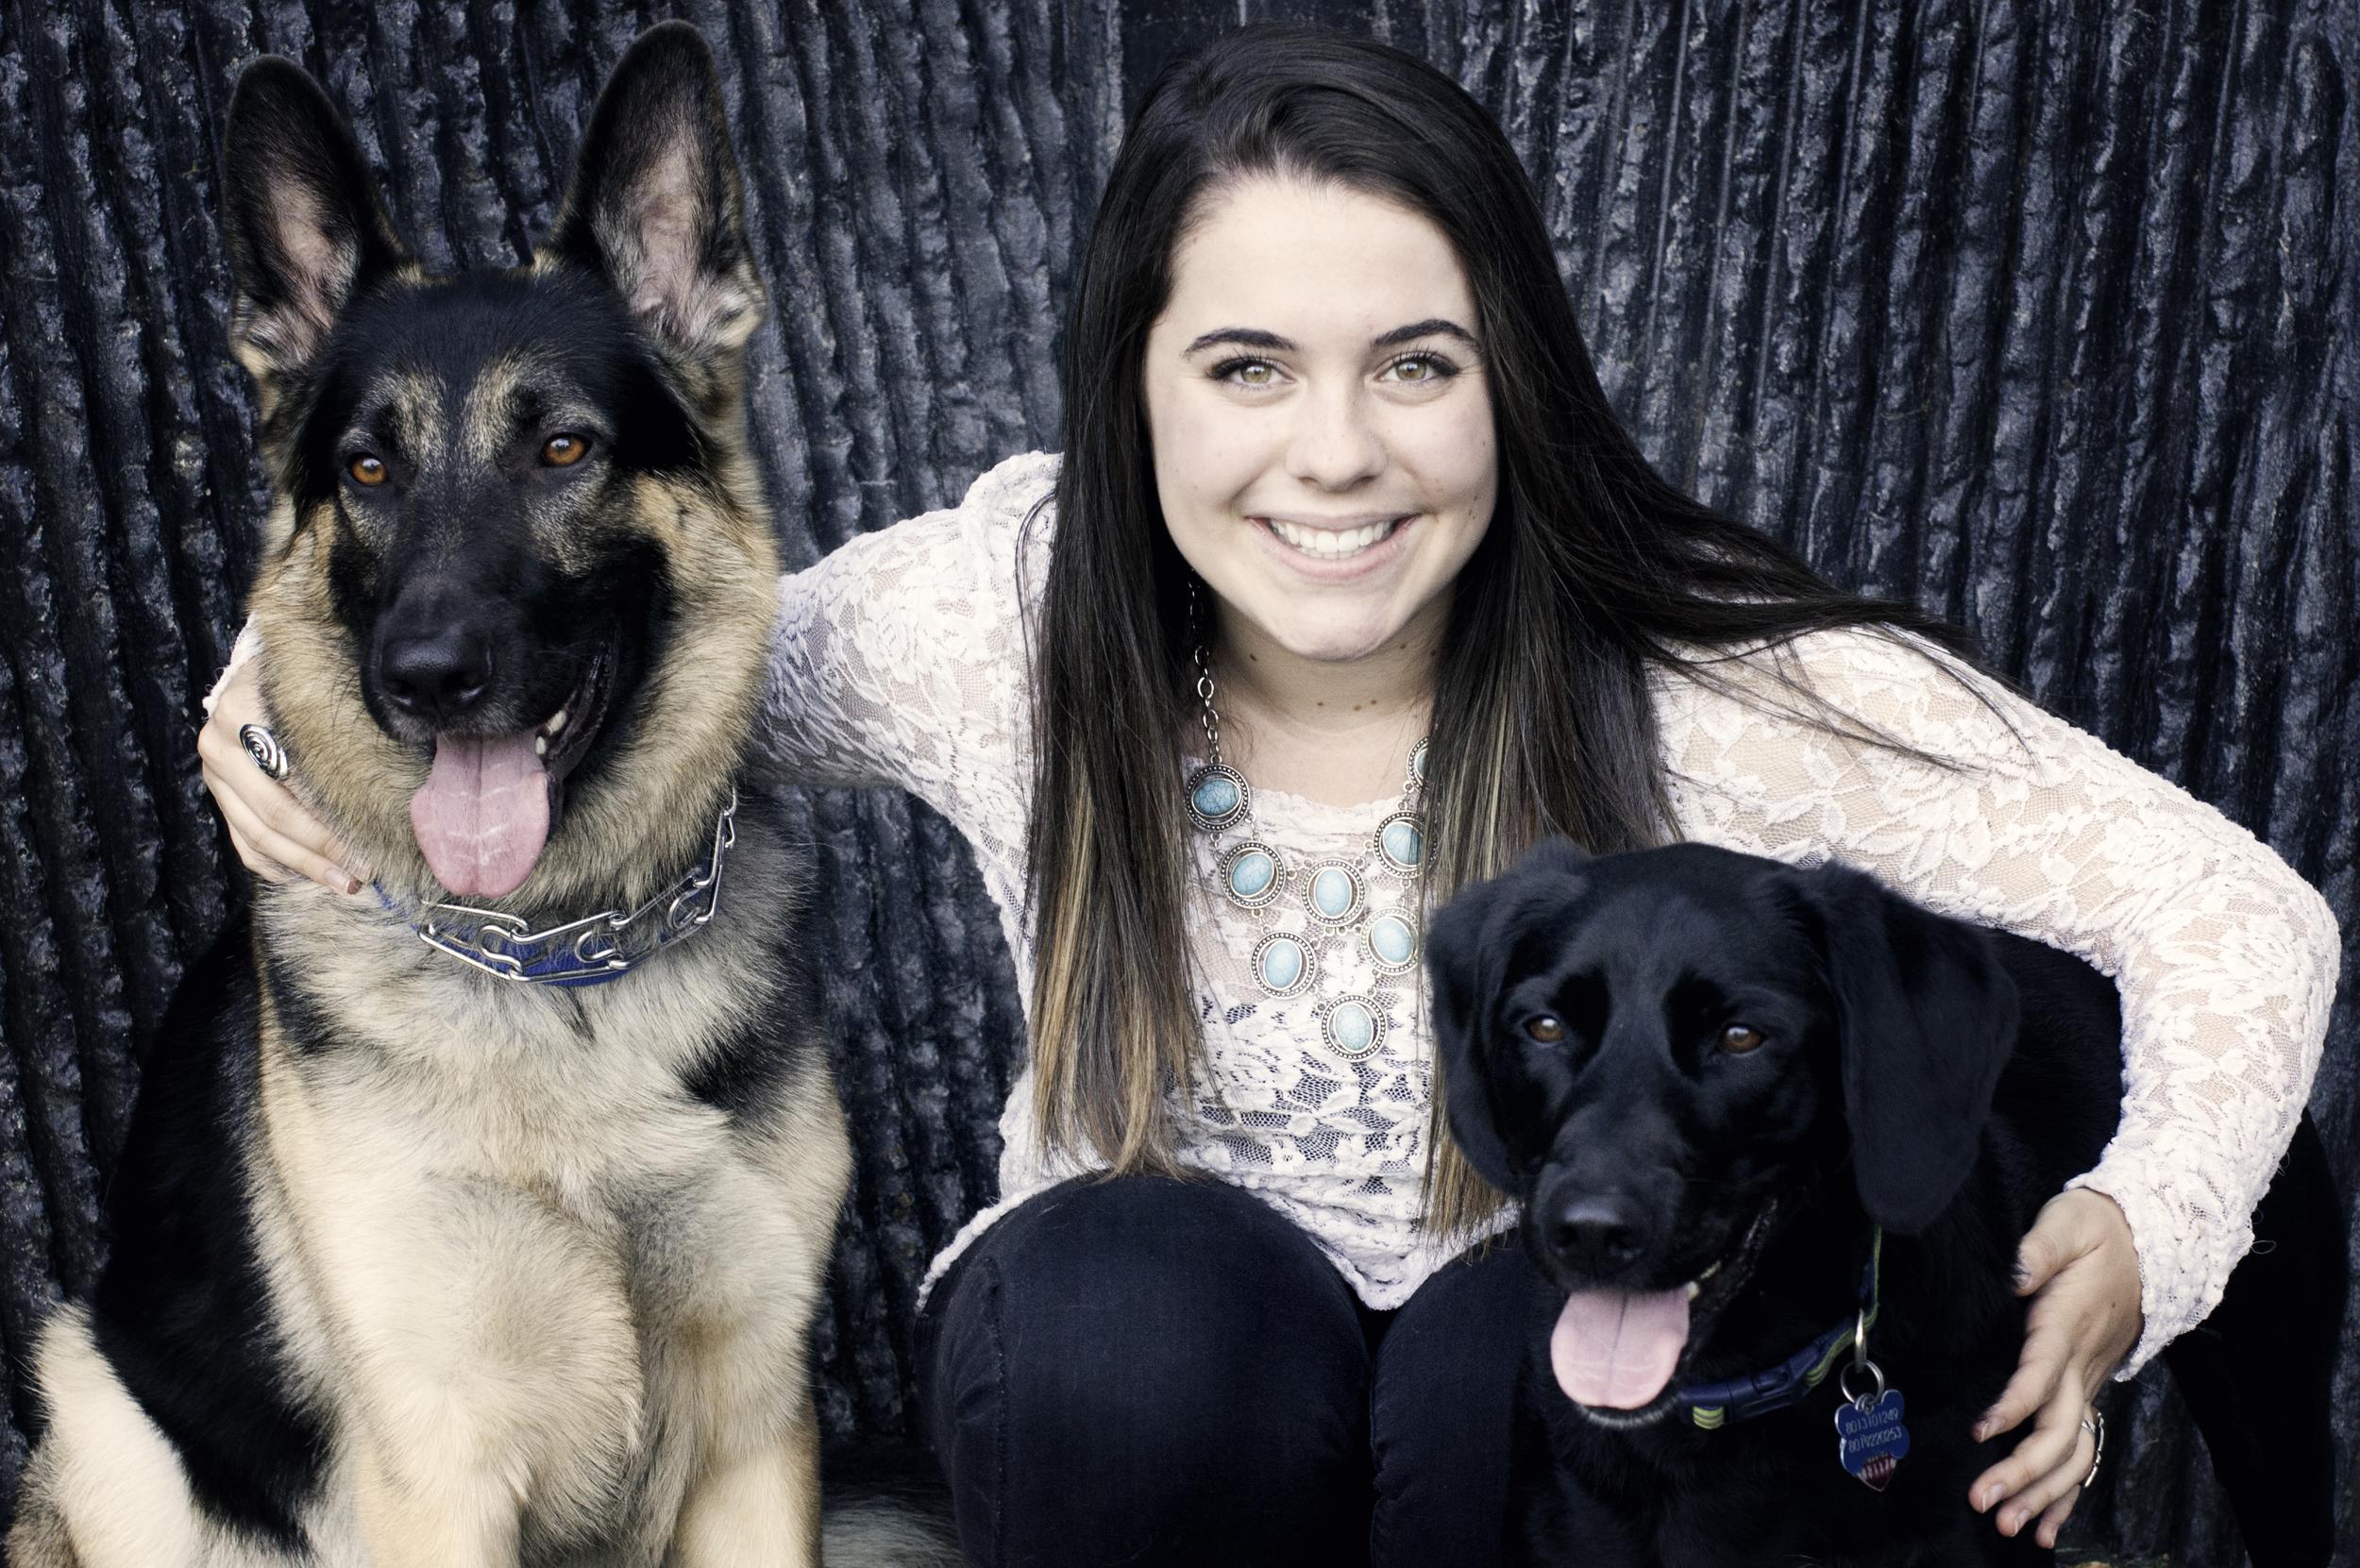 Ray Family Photos-Angela and dogs.jpg